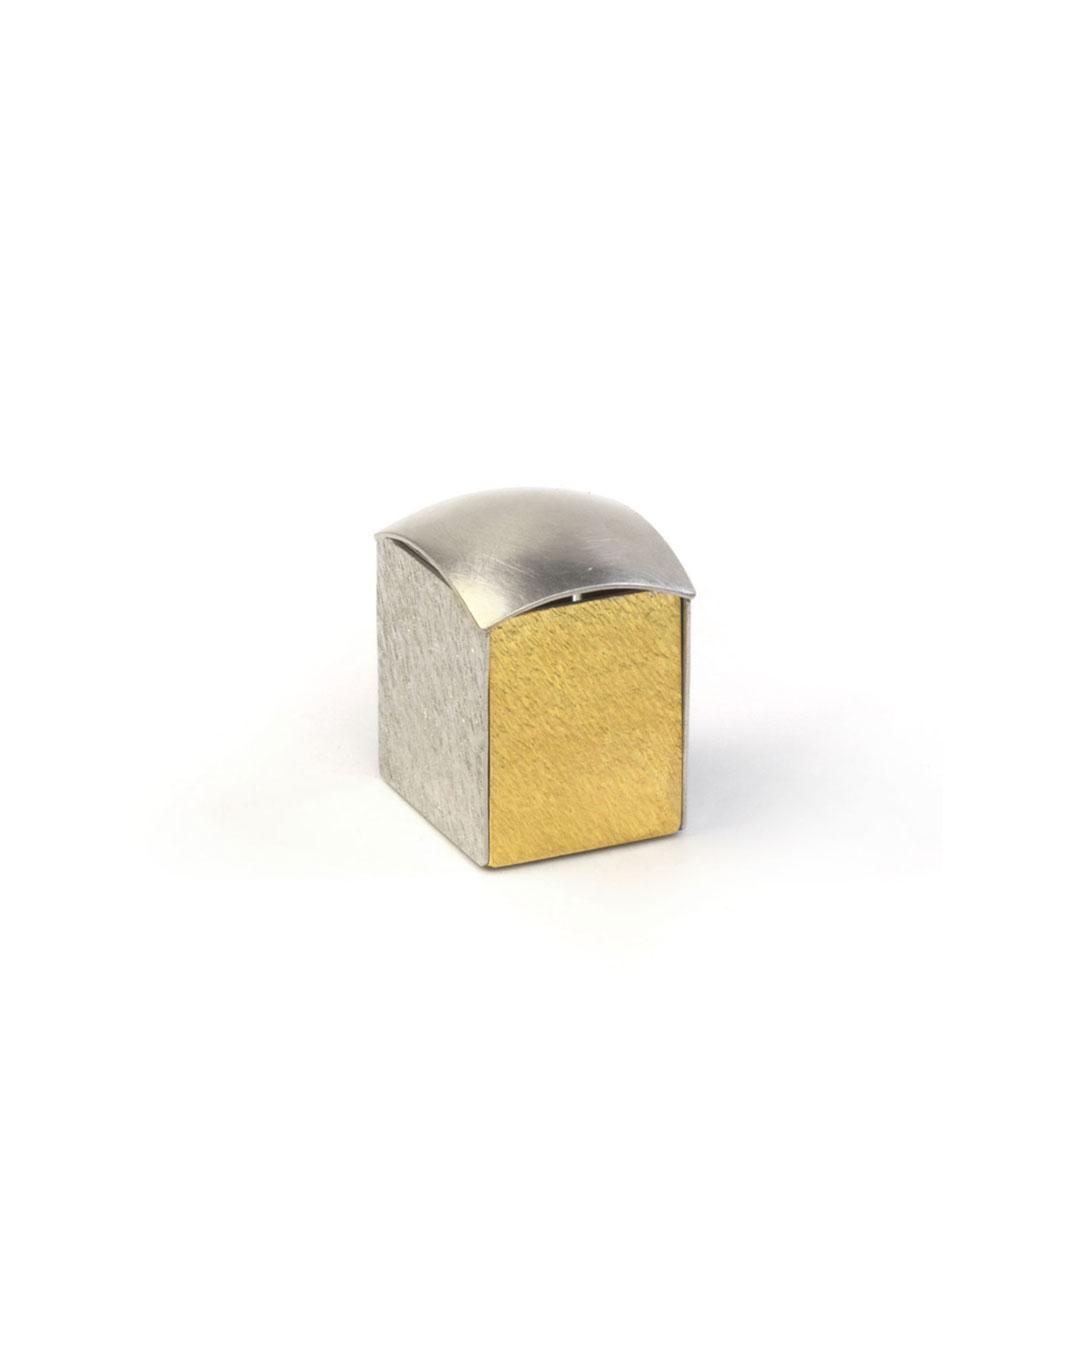 Okinari Kurokawa, untitled, 2008, ring; 970 silver, 835 gold, 23 x 20 x 17 mm, €1700